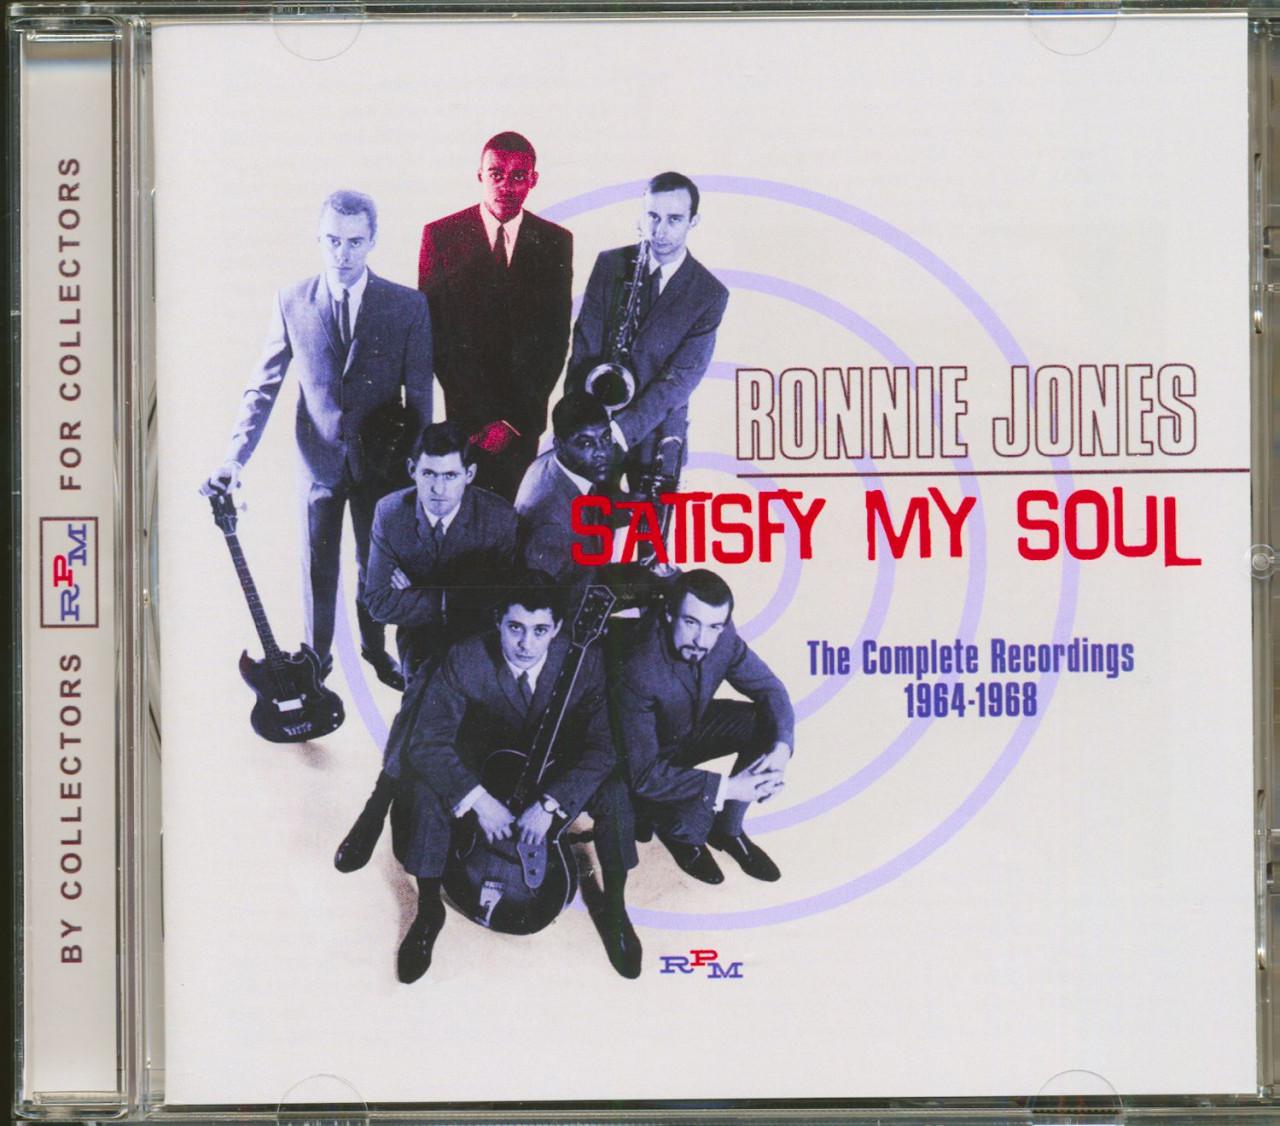 Ronnie Jones - Satisfy My Soul - The Complete Recordings 1964-1968 (CD)